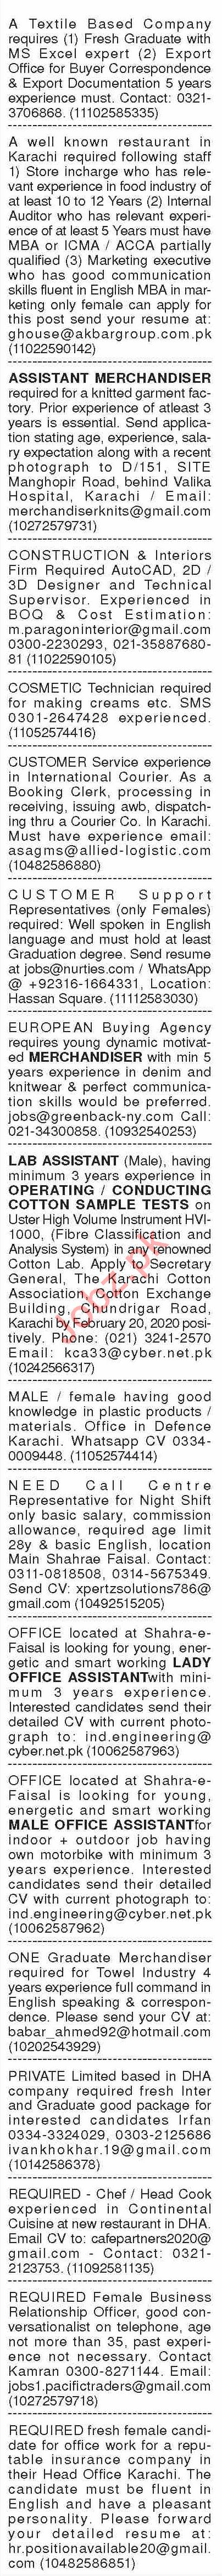 Dawn Sunday Classified Ads 16 Feb 2020 for General Staff